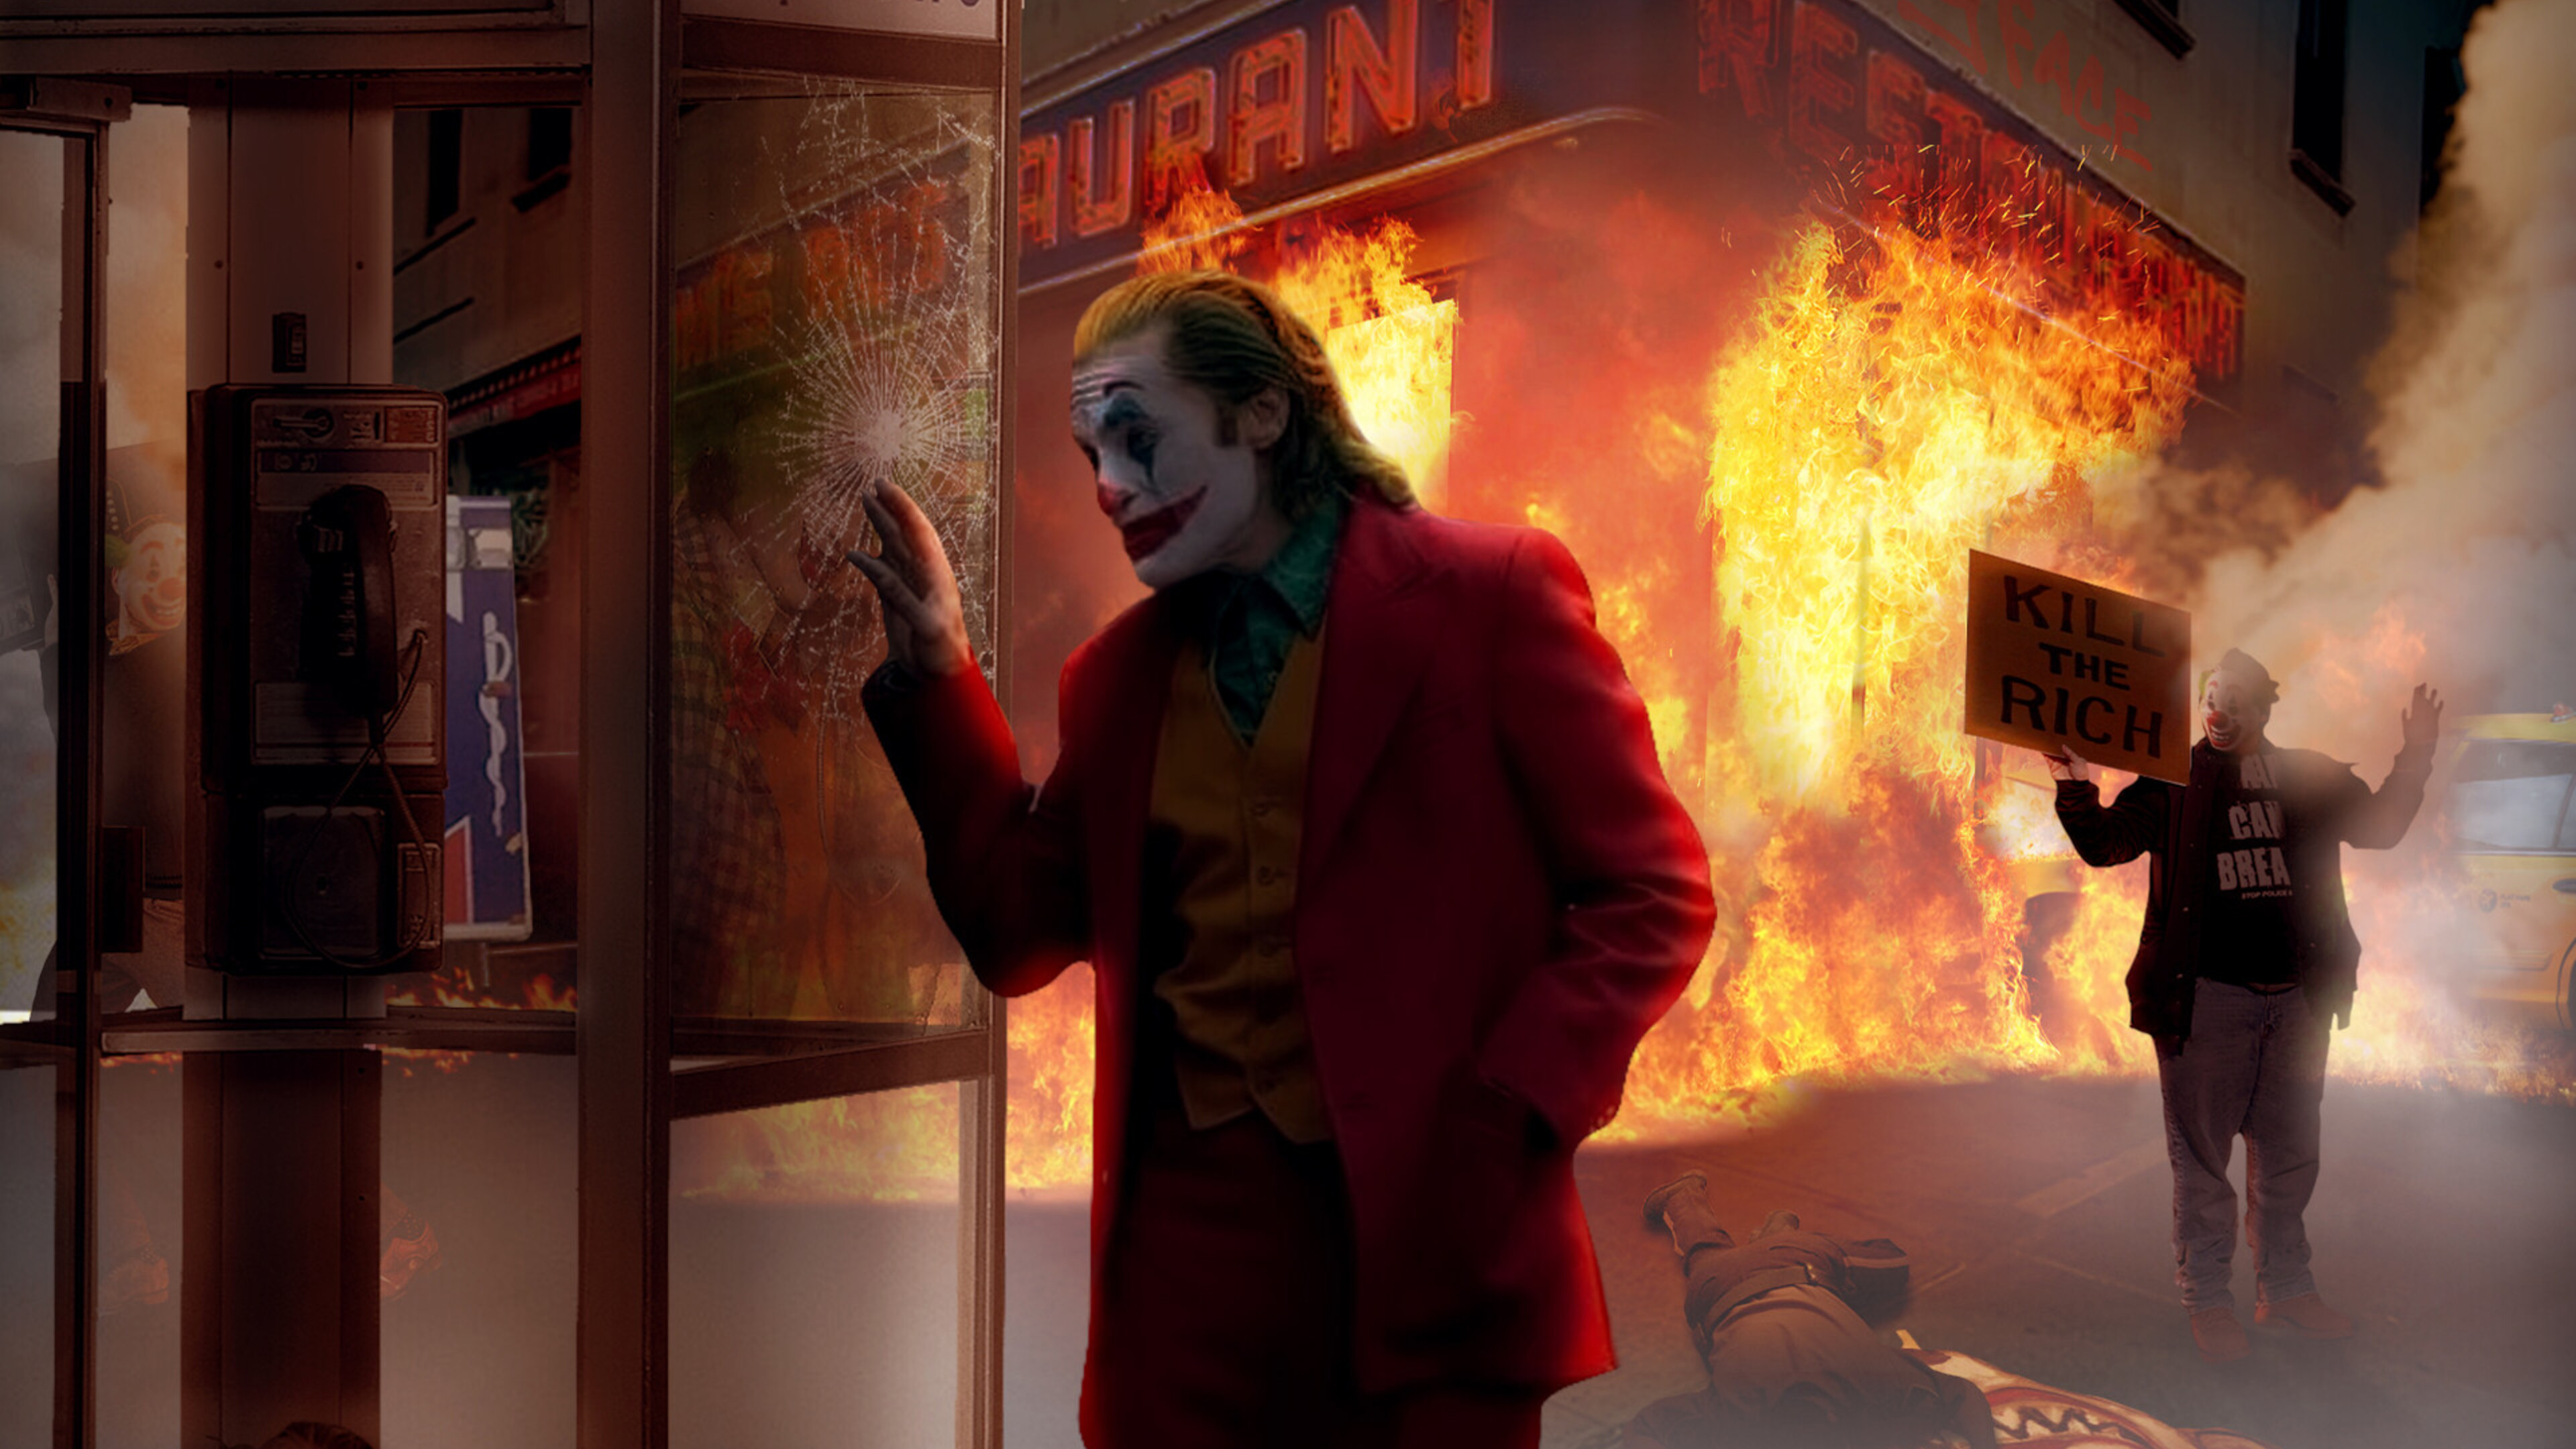 joker-burn-the-city-yi.jpg